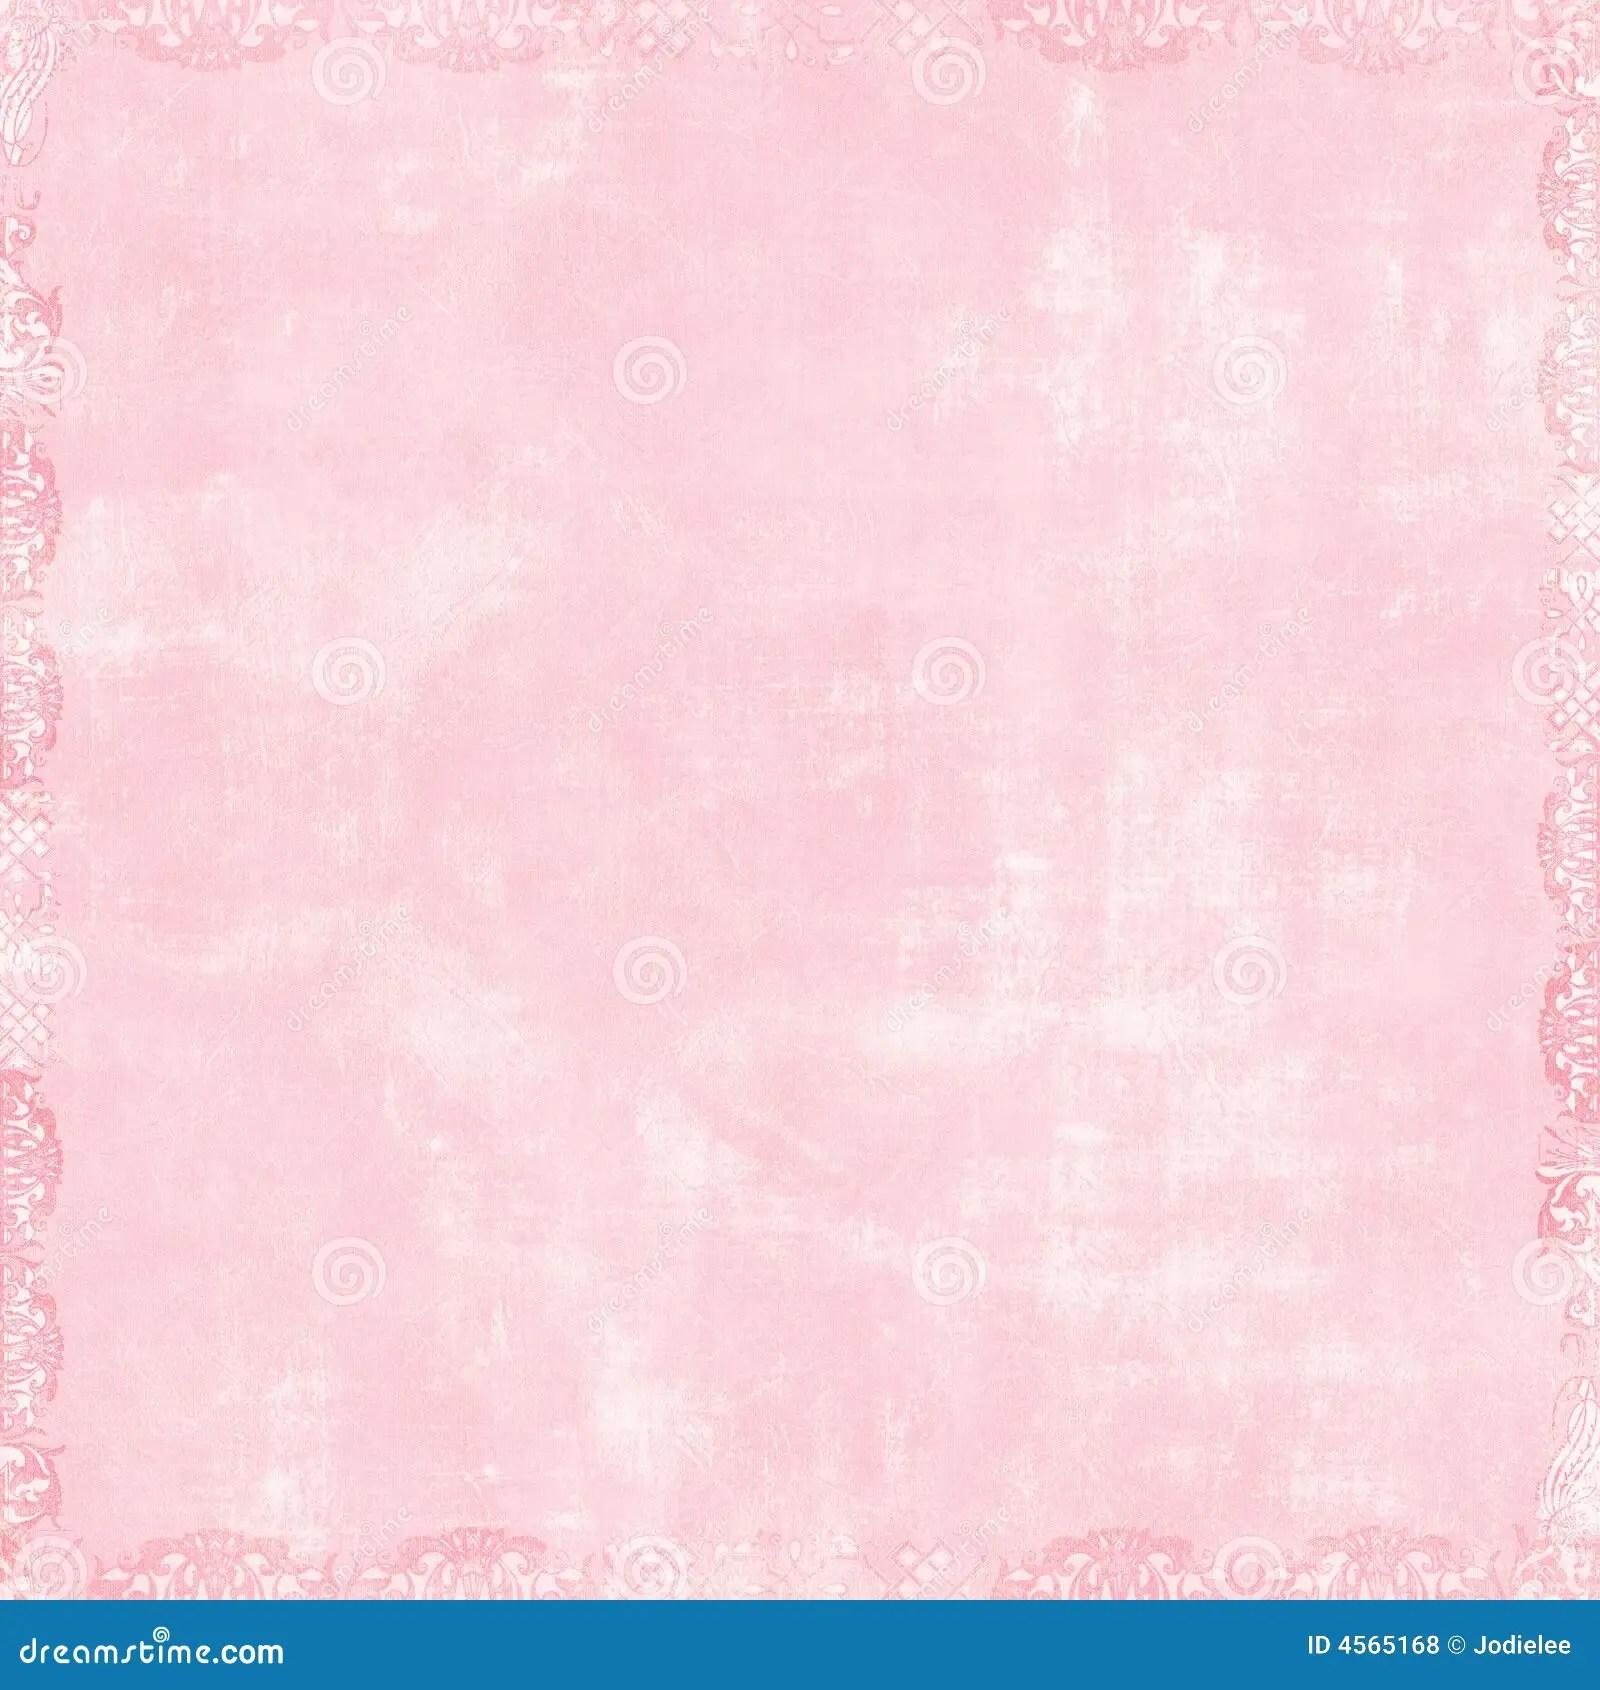 Baby Pink Iphone Wallpaper Soft Pink Scrapbook Background Stock Illustration Image